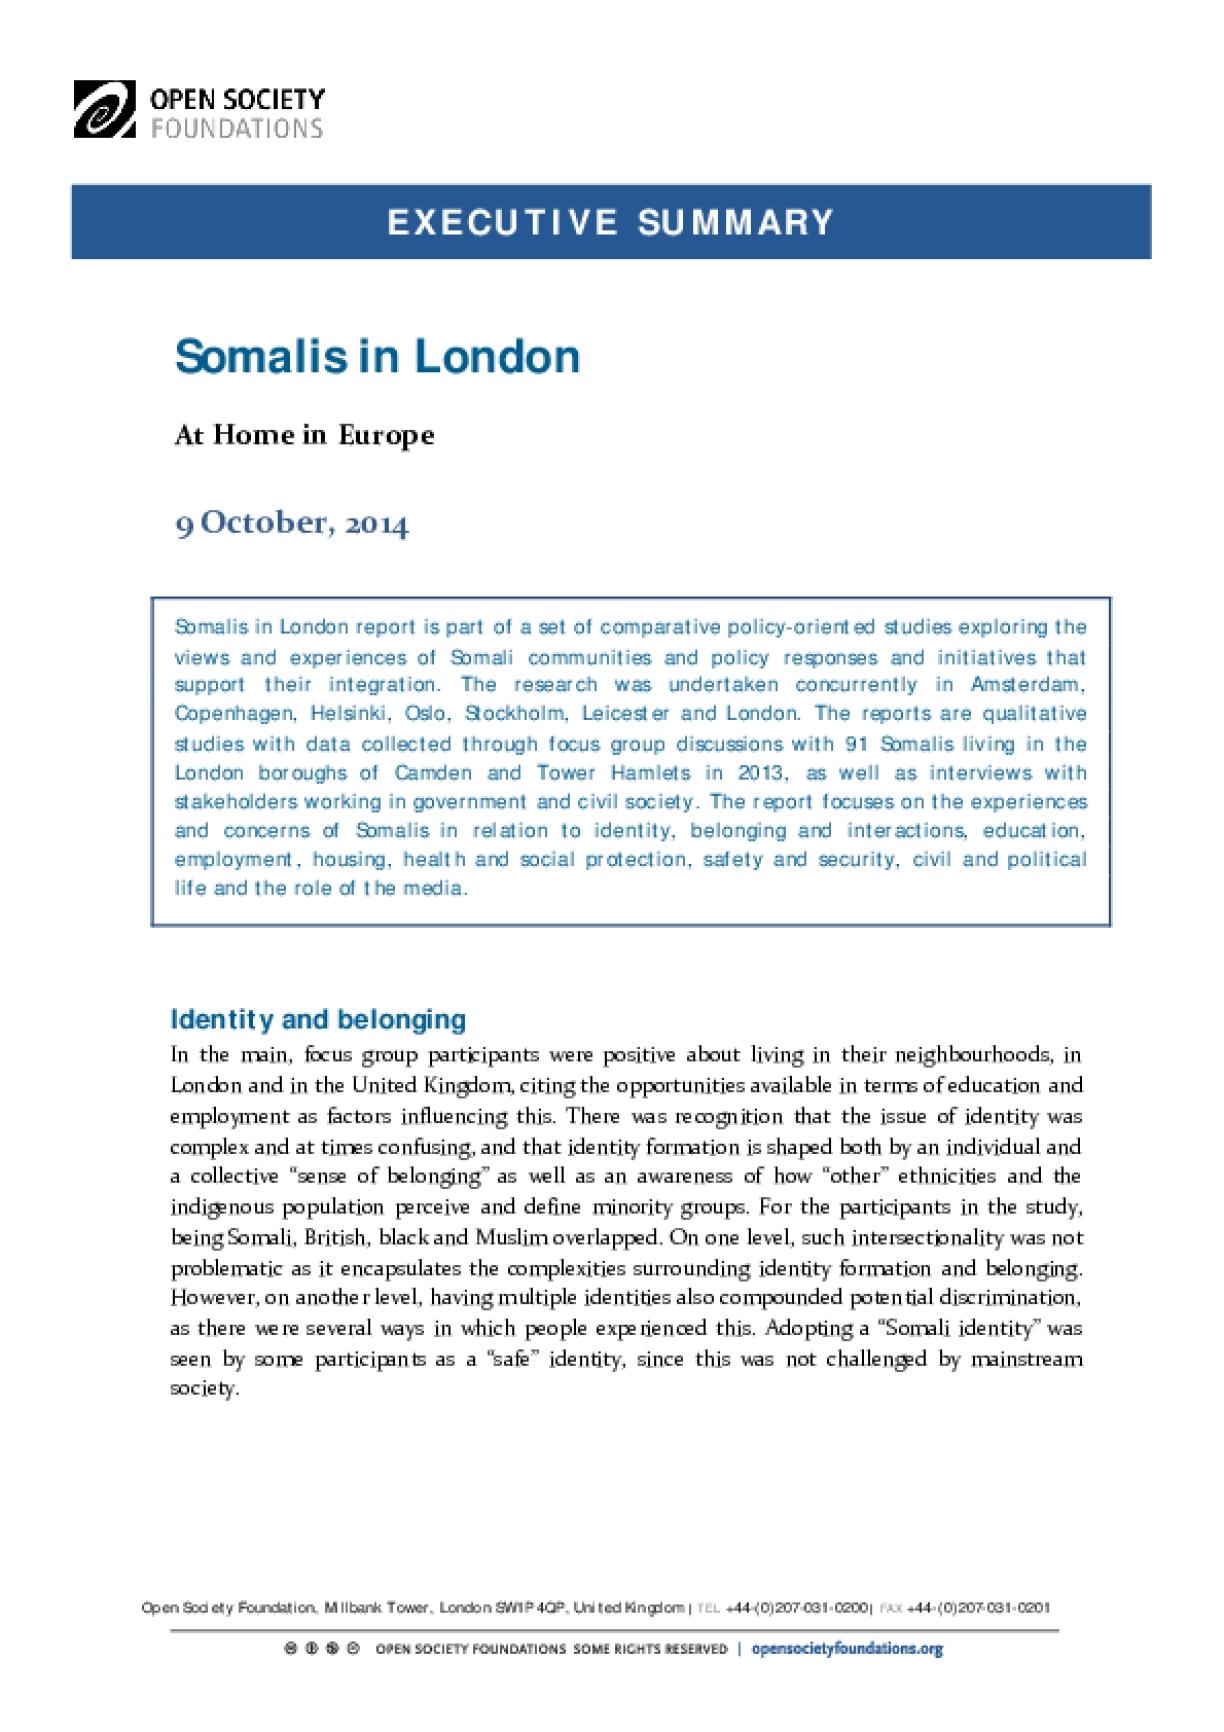 Somalis in London: Executive Summary